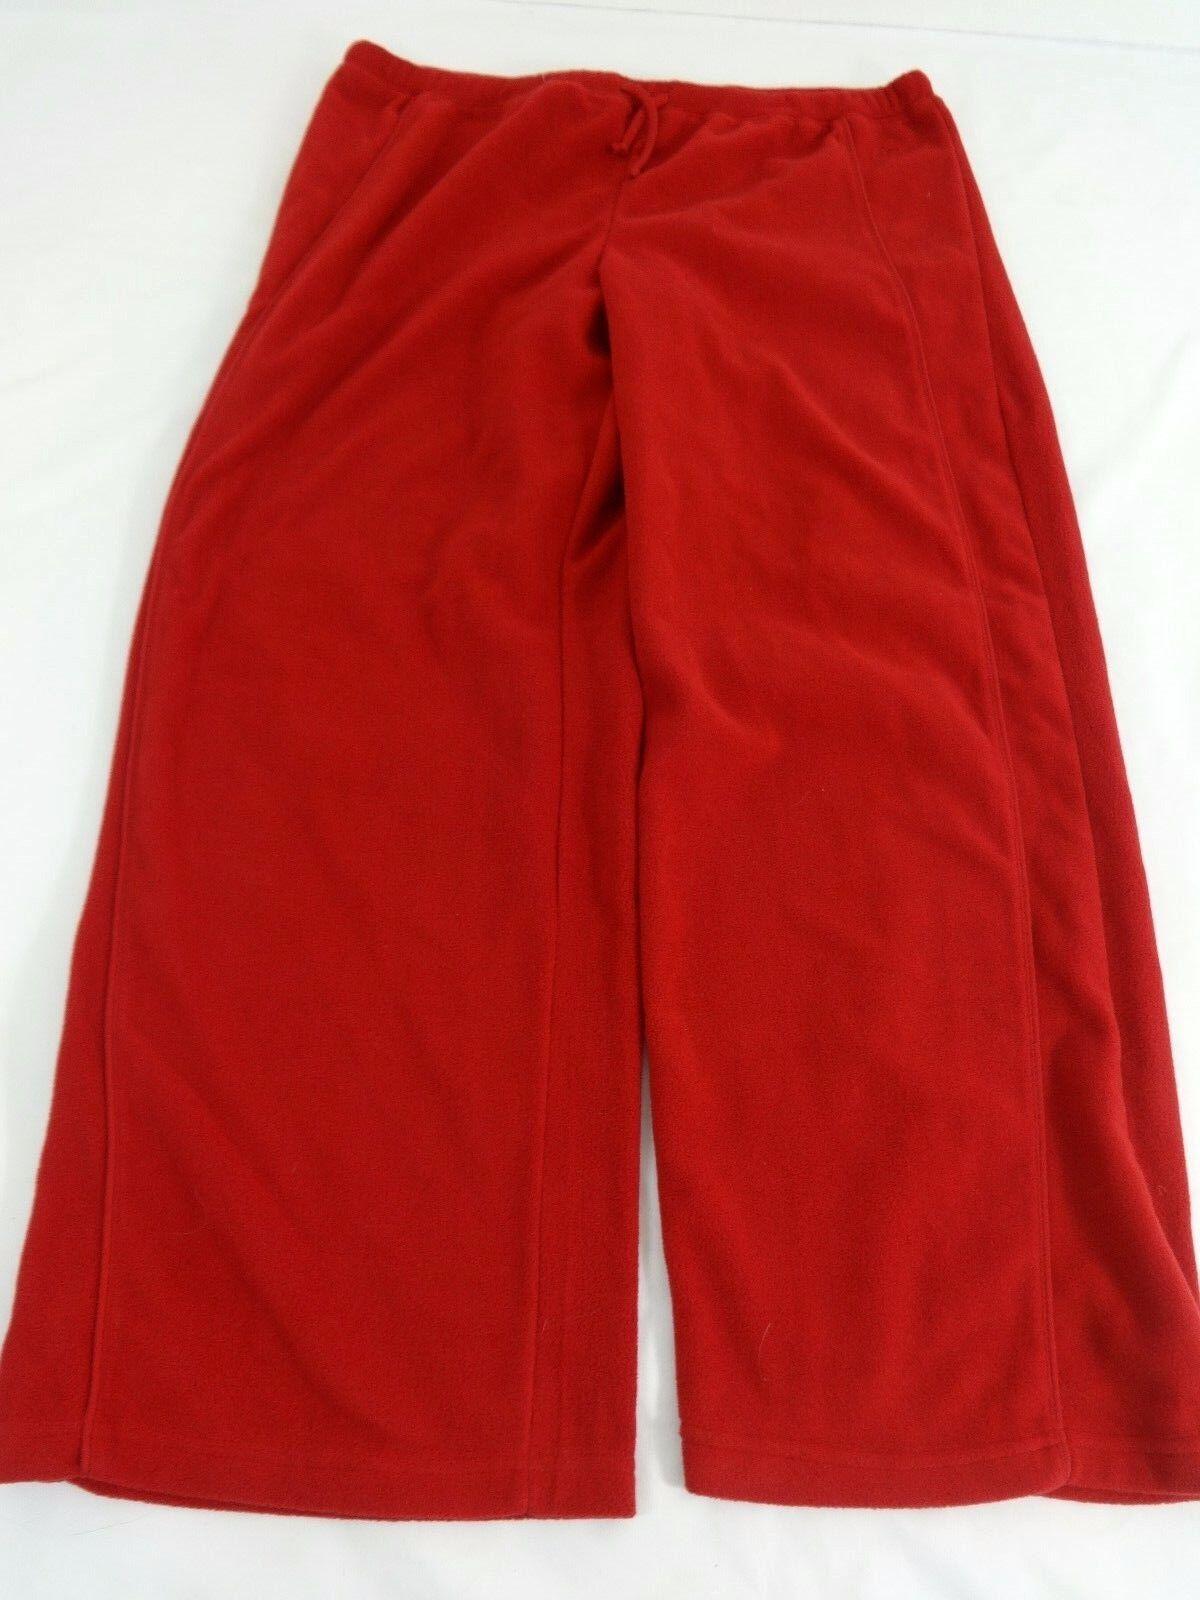 Athletch Damen Rot Vlies Sporthose Größe XL